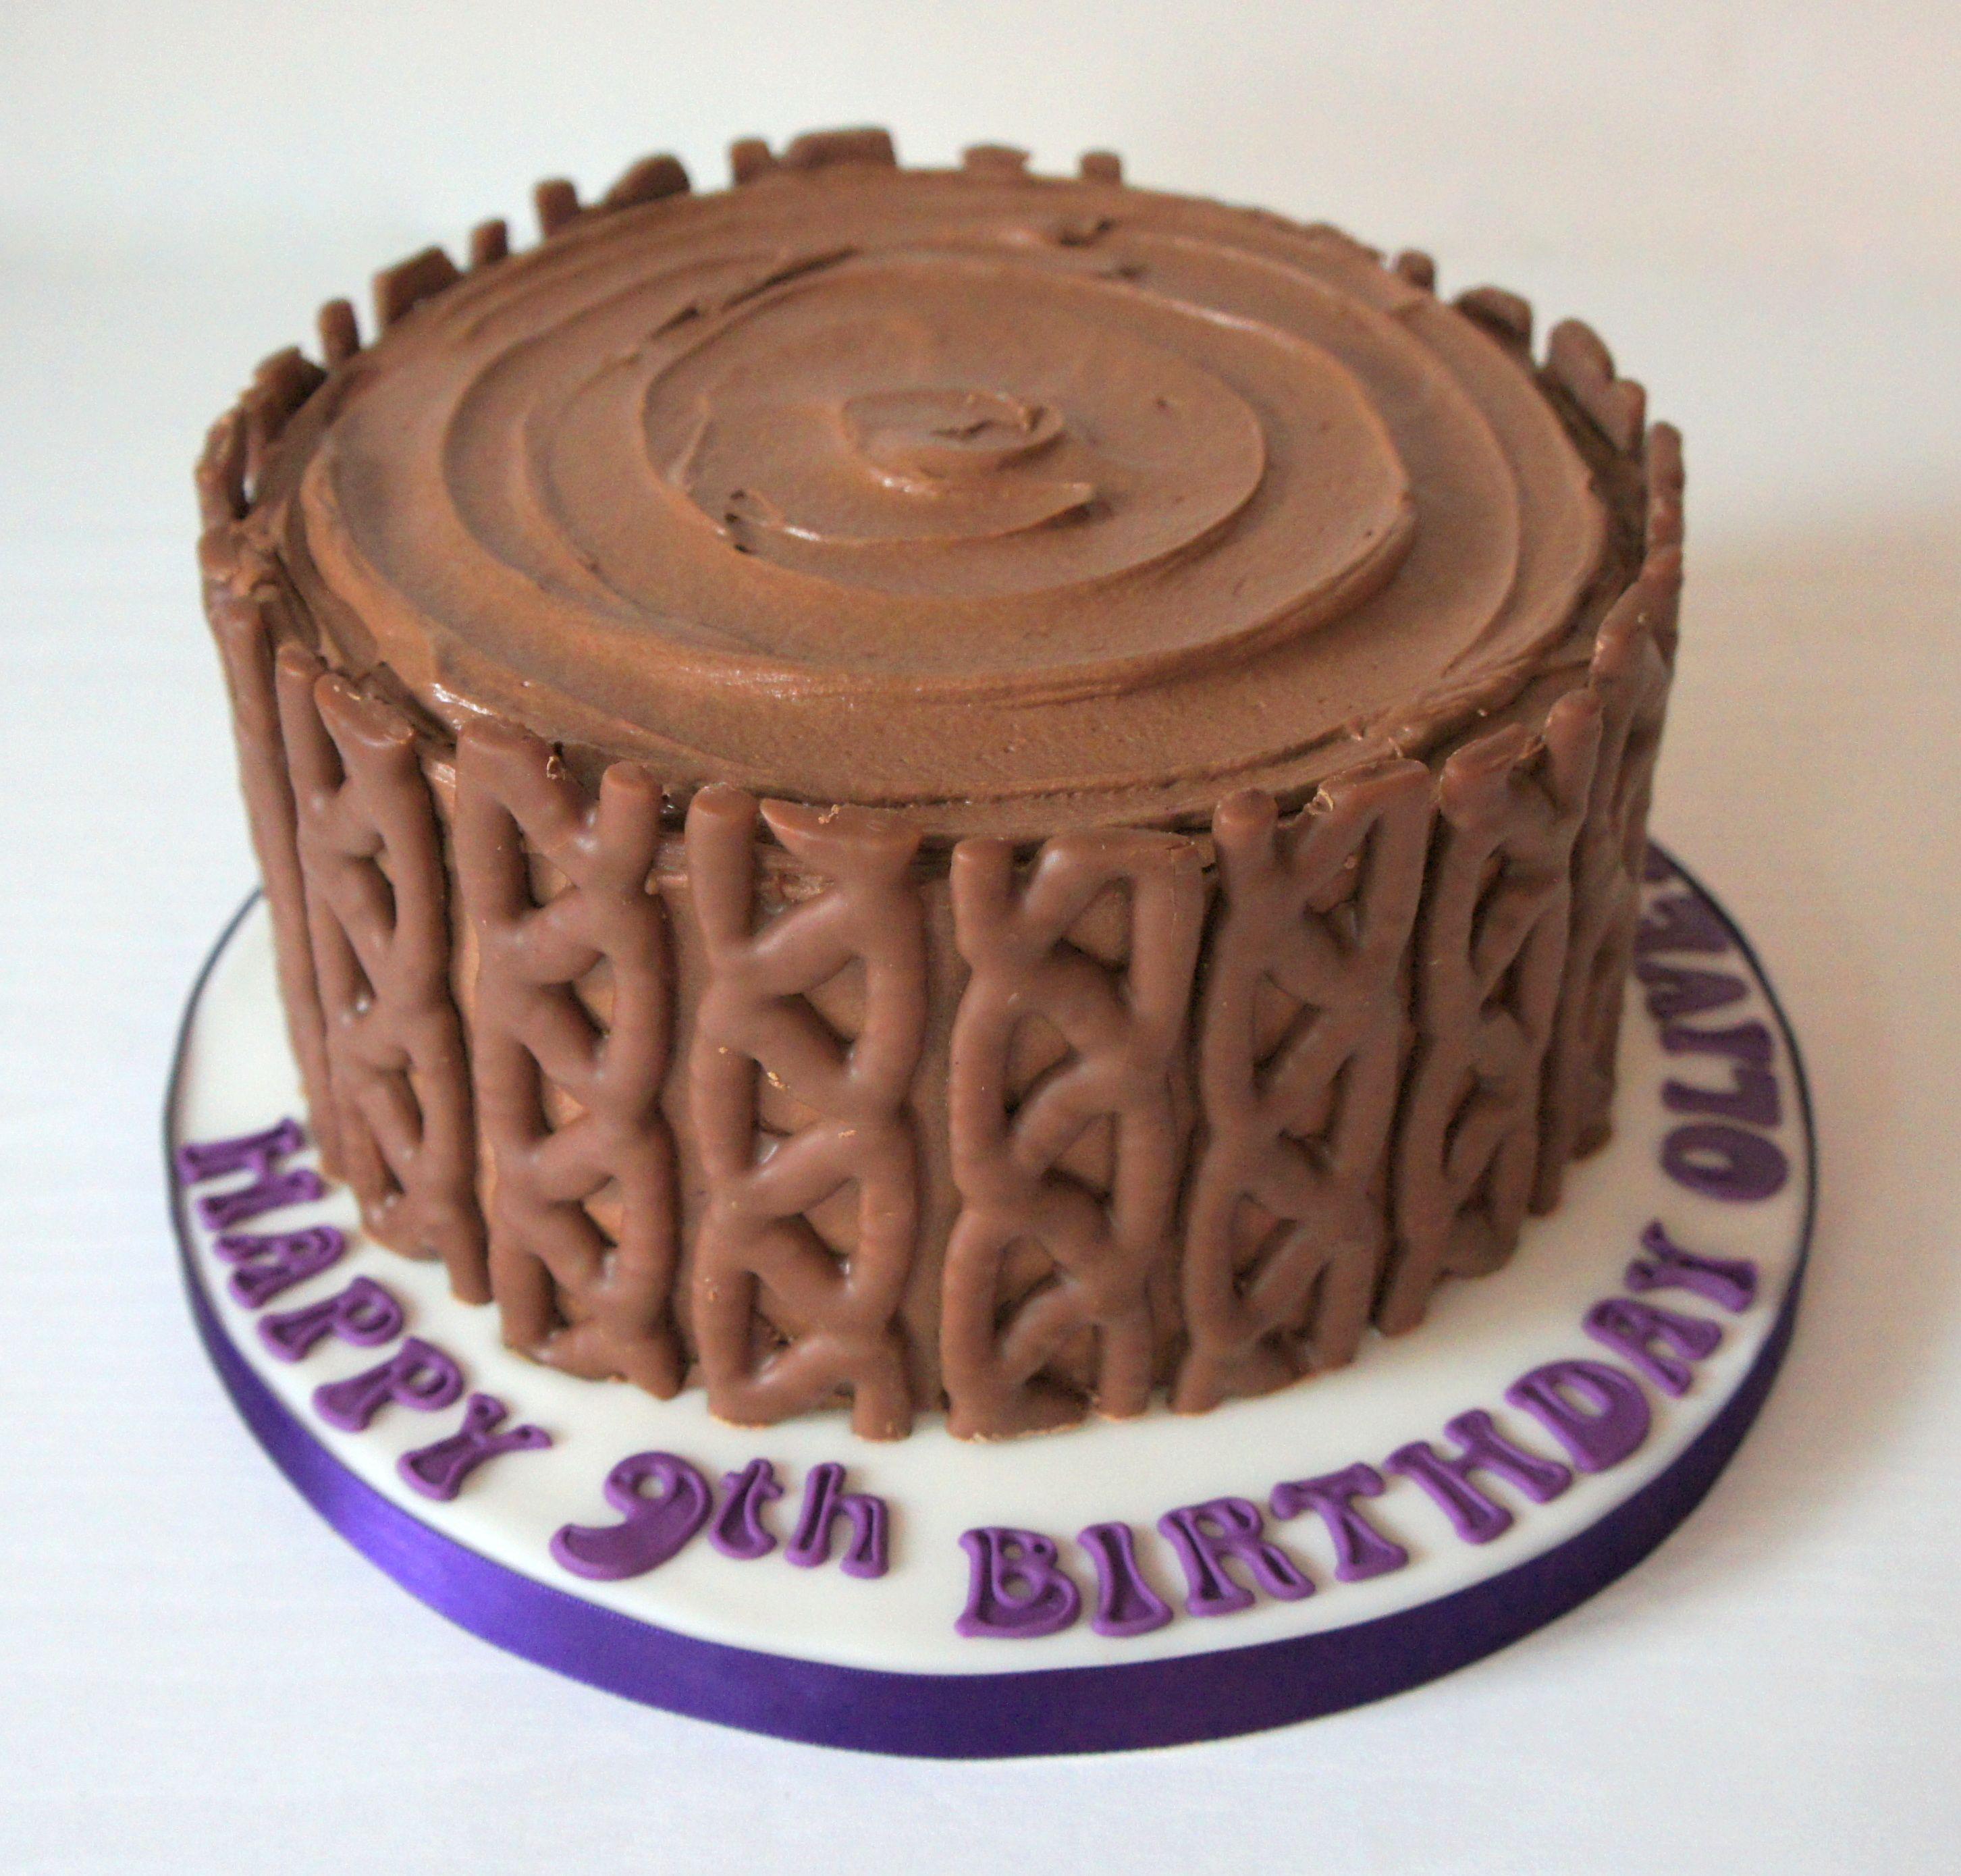 chocolate curly wurly birthday cake by wwwbyjojocouk F O O D